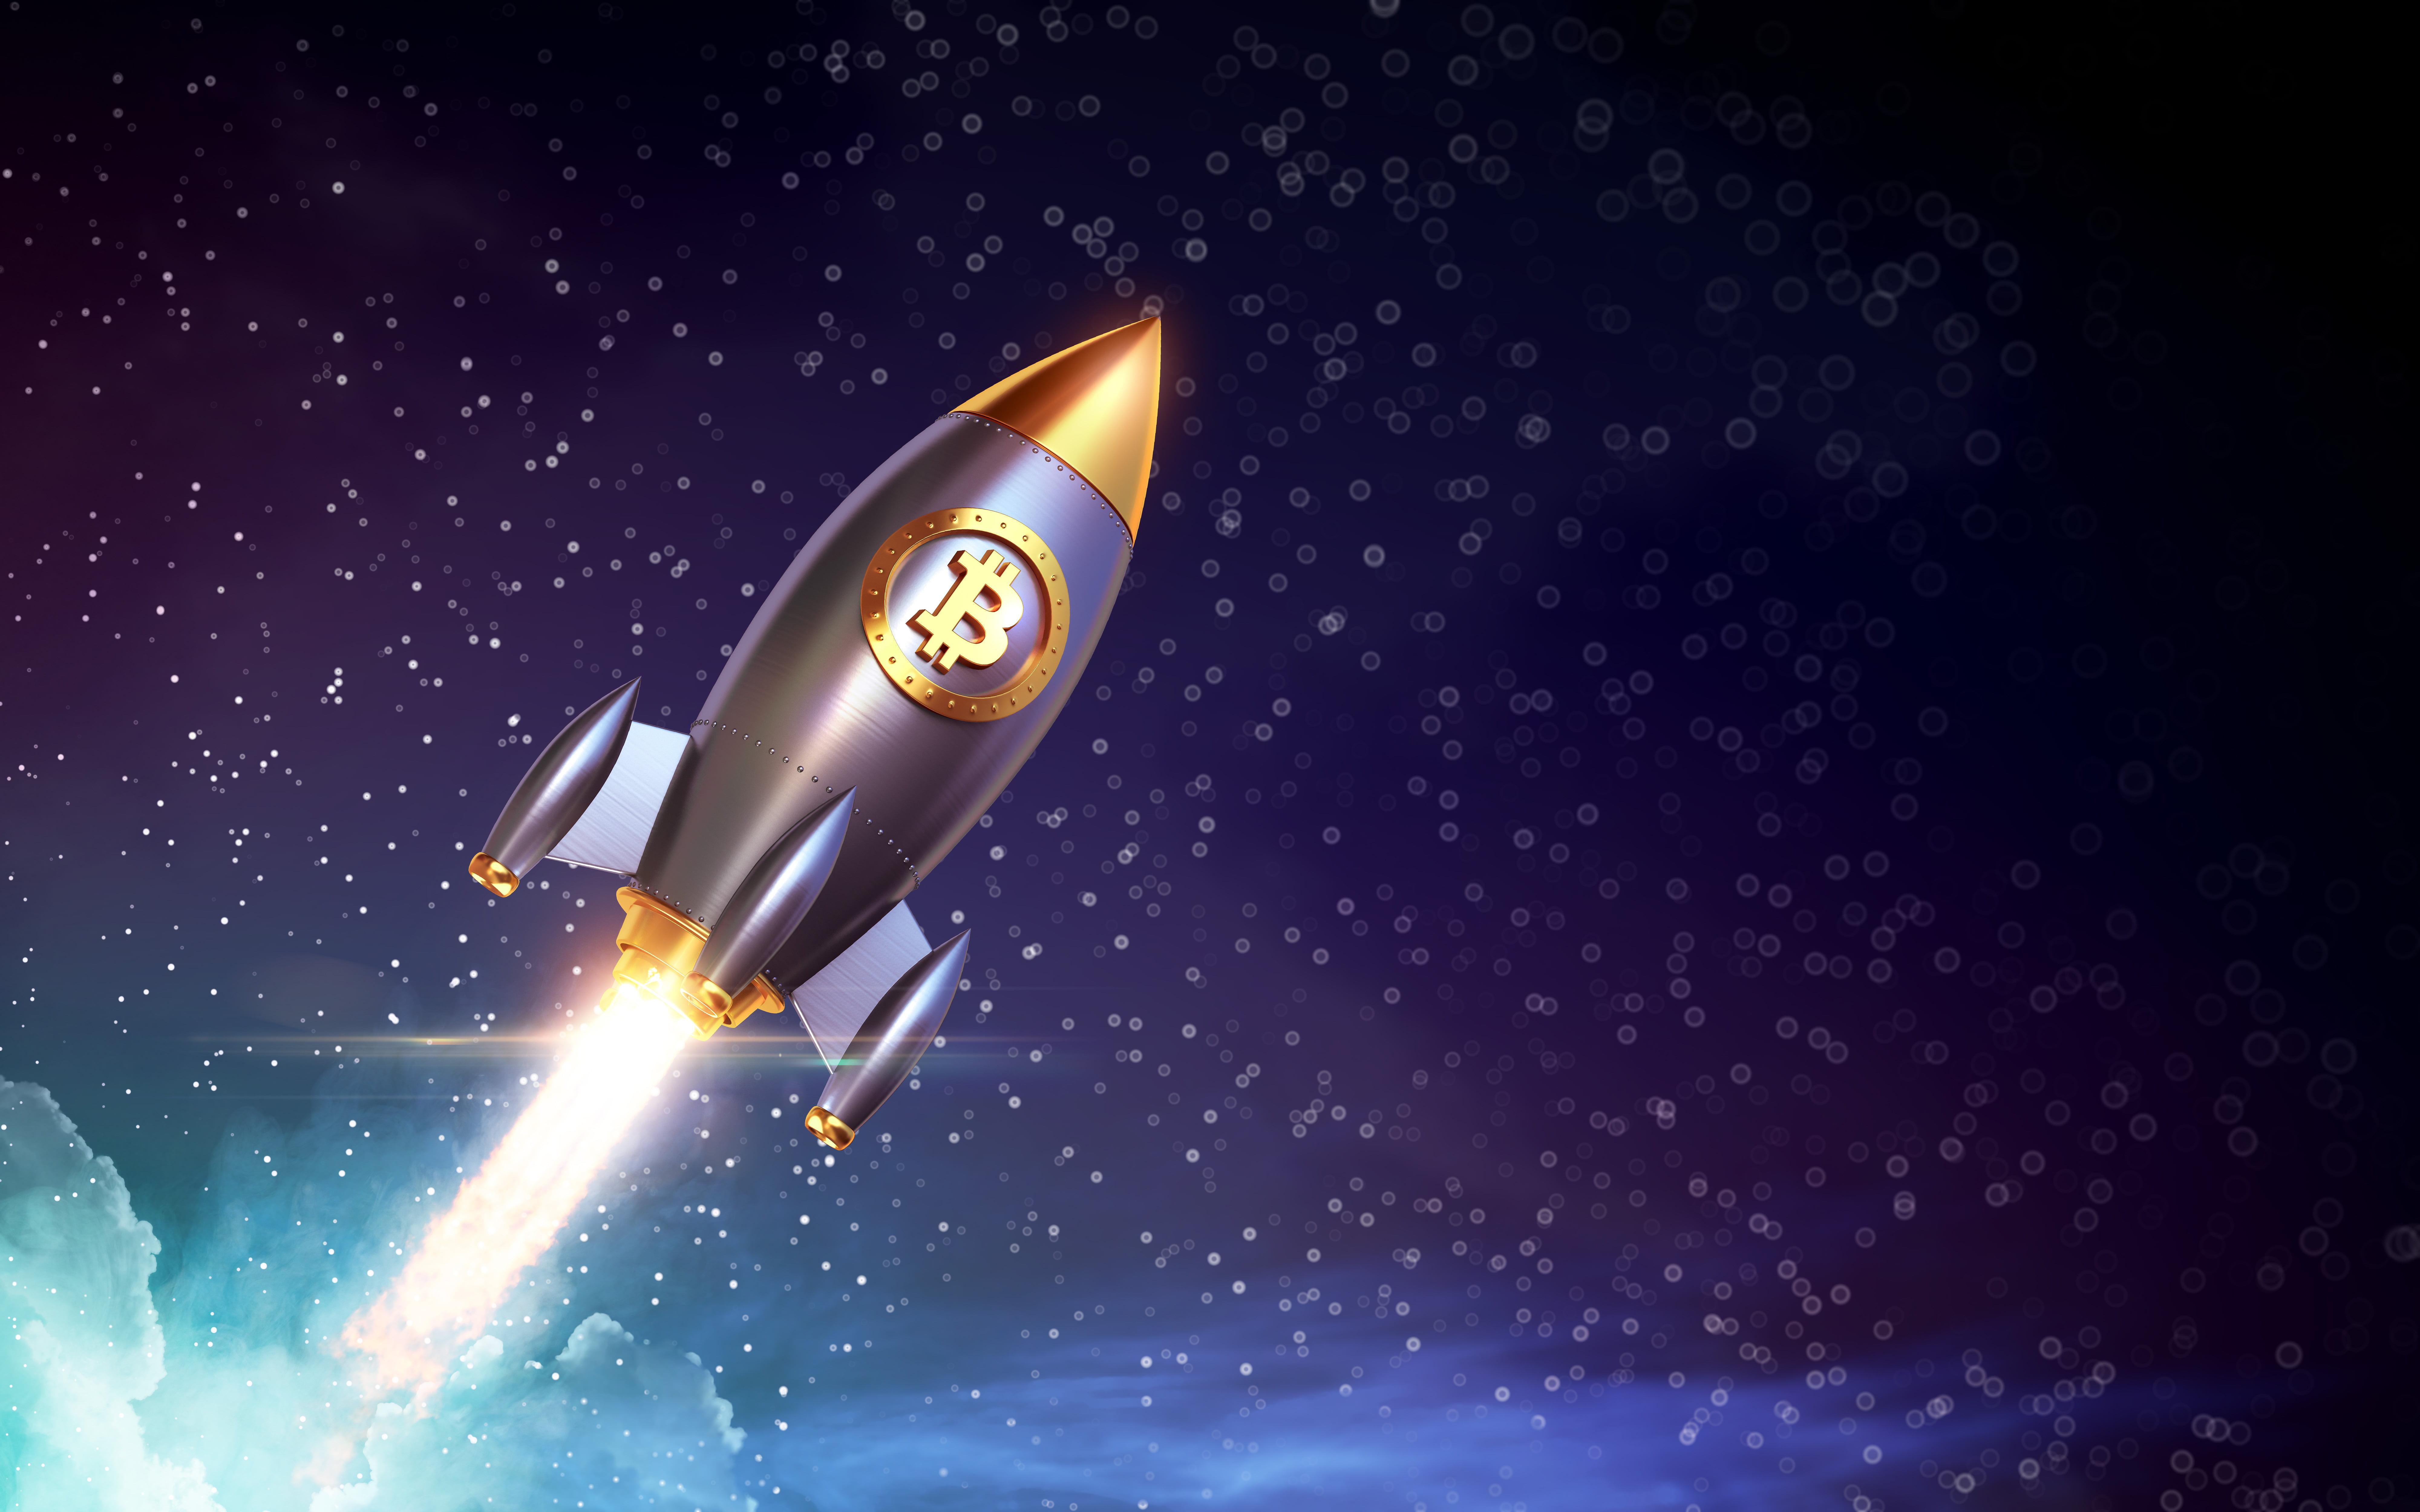 How to earn bitcoin - rocket